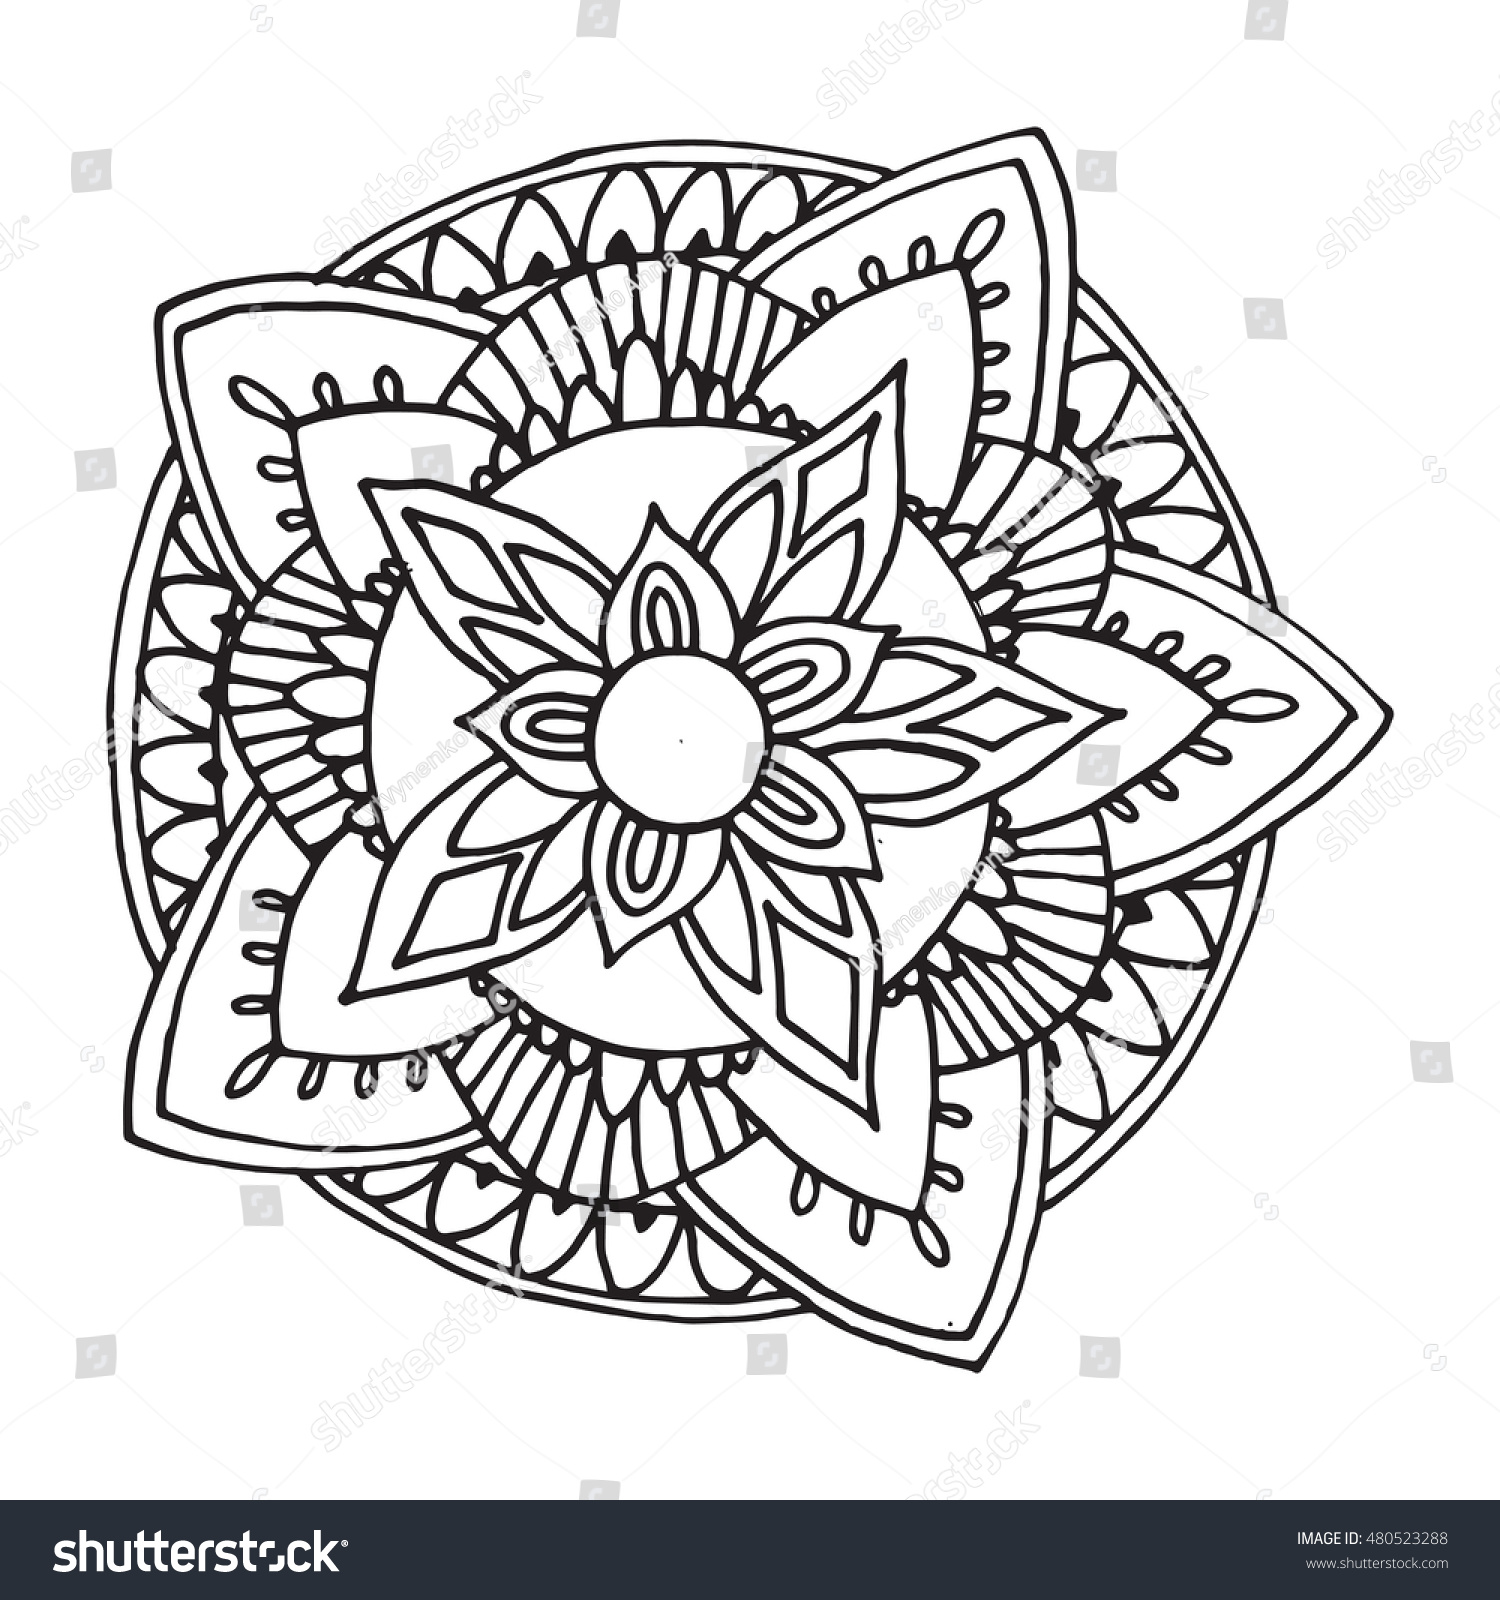 Zentangle Mandala Coloring Book Adults Made Stock Vector HD Royalty